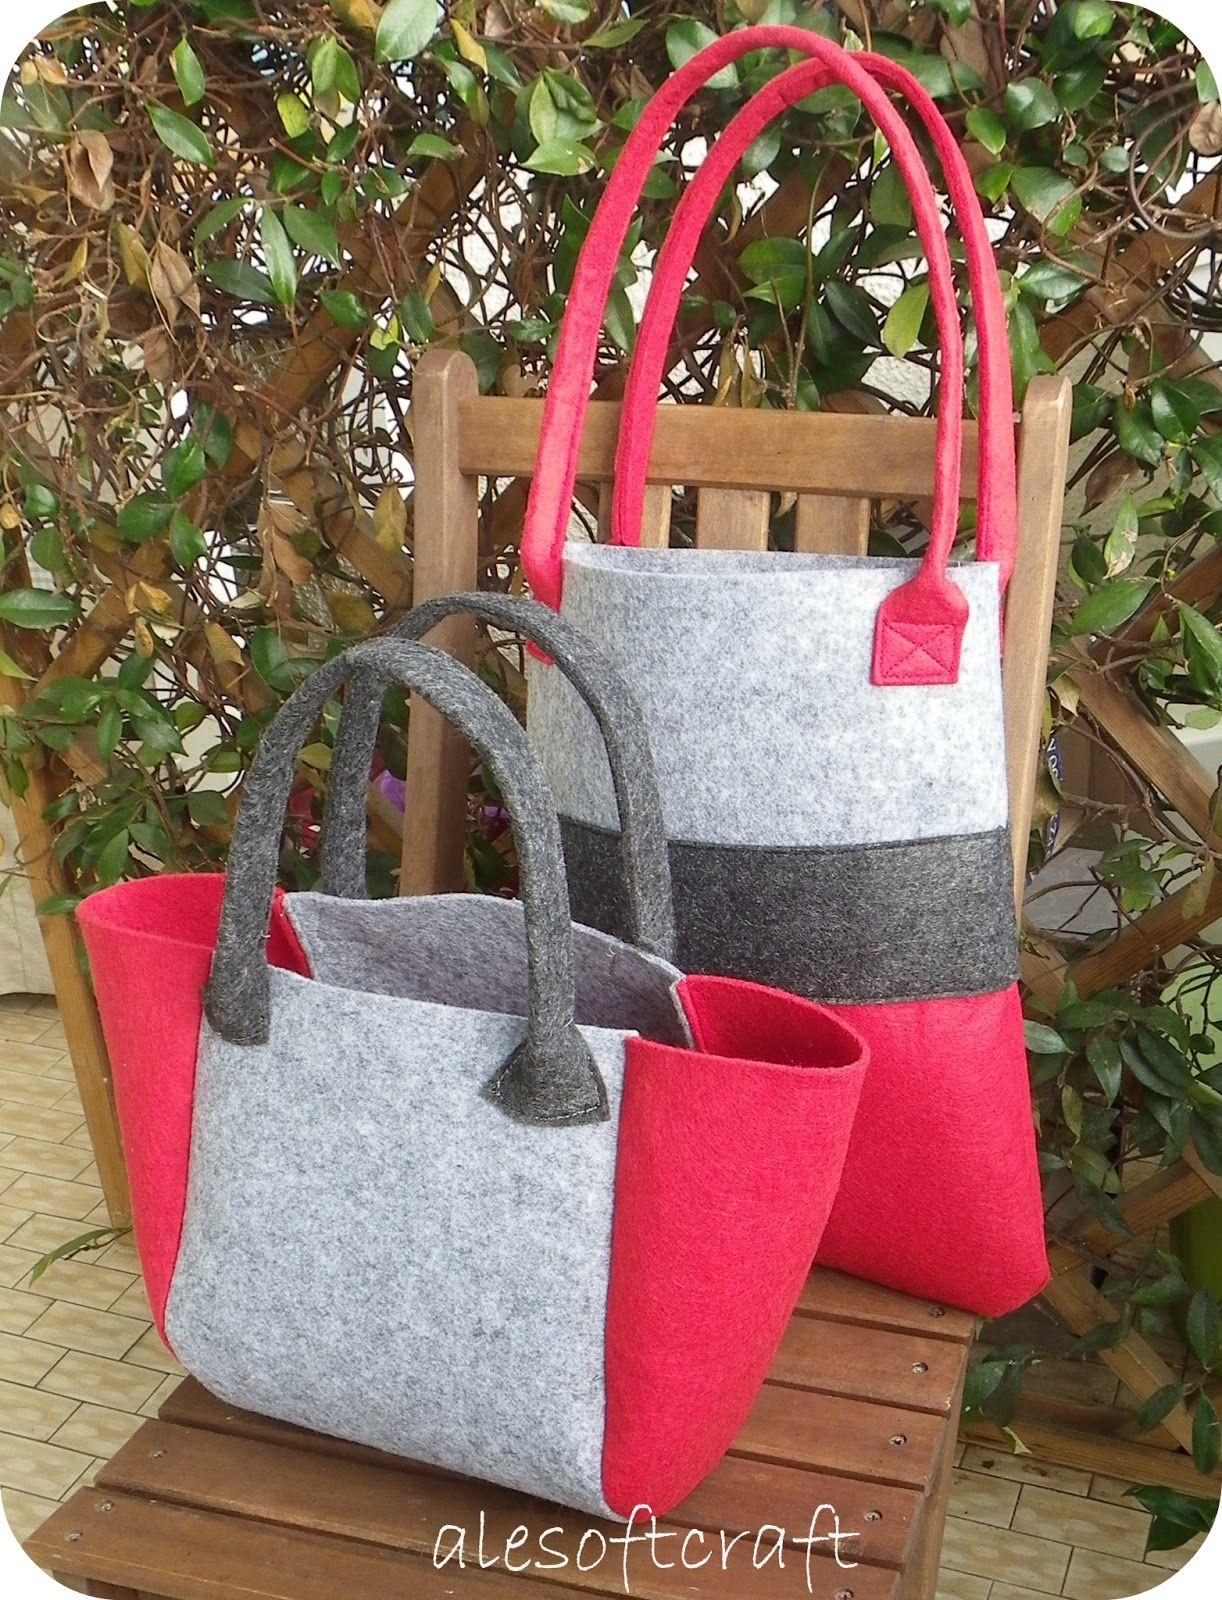 Ale soft craft - feltro